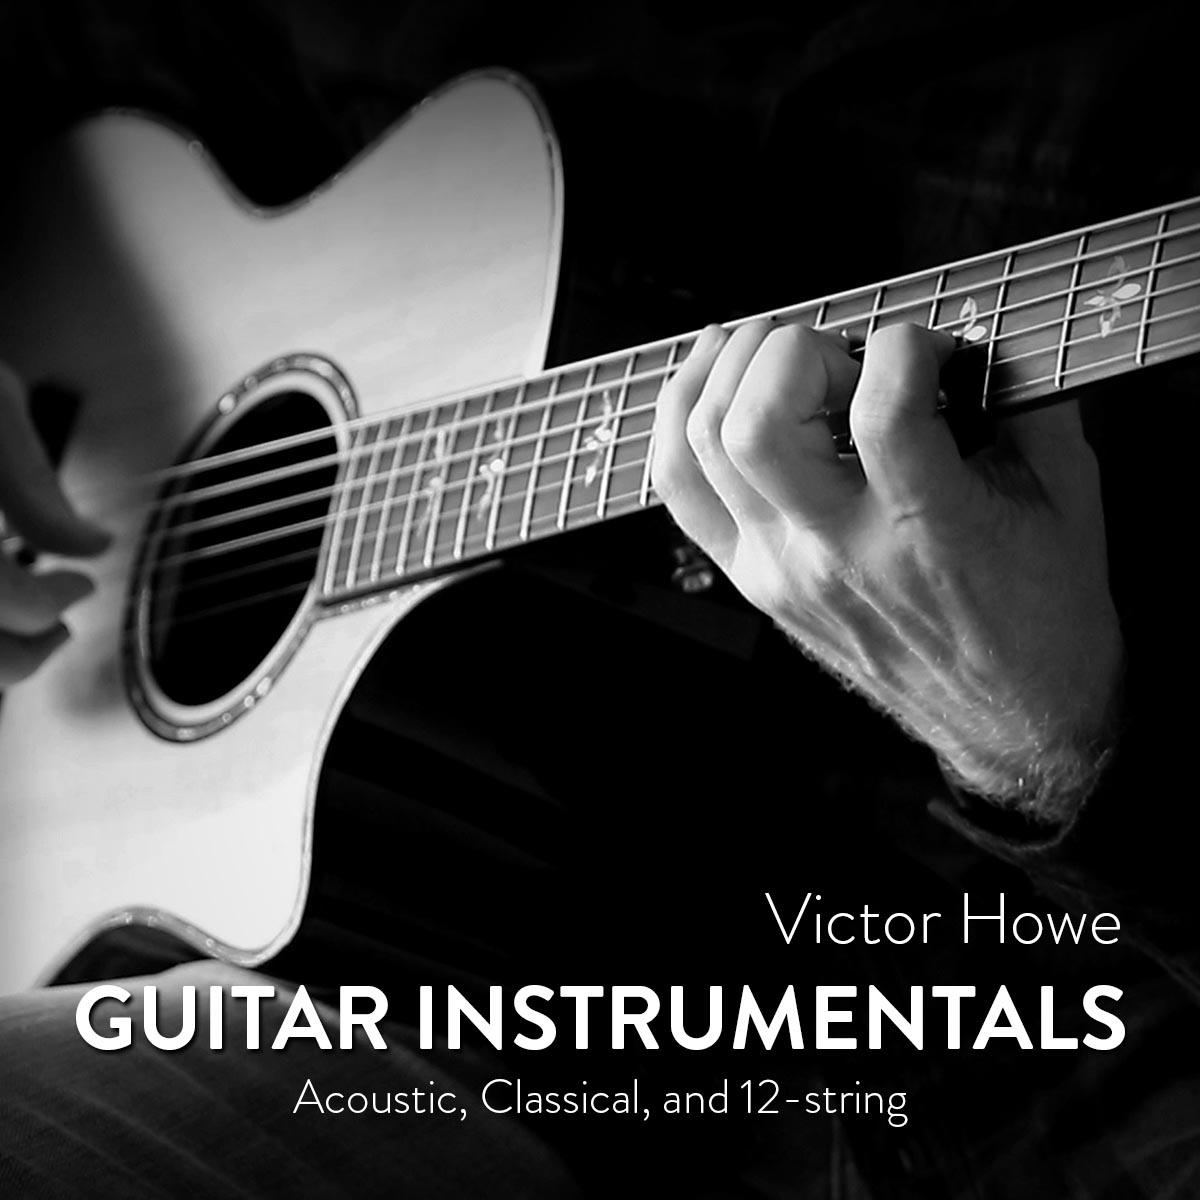 Victor Howe Guitar Instrumentals Playlist